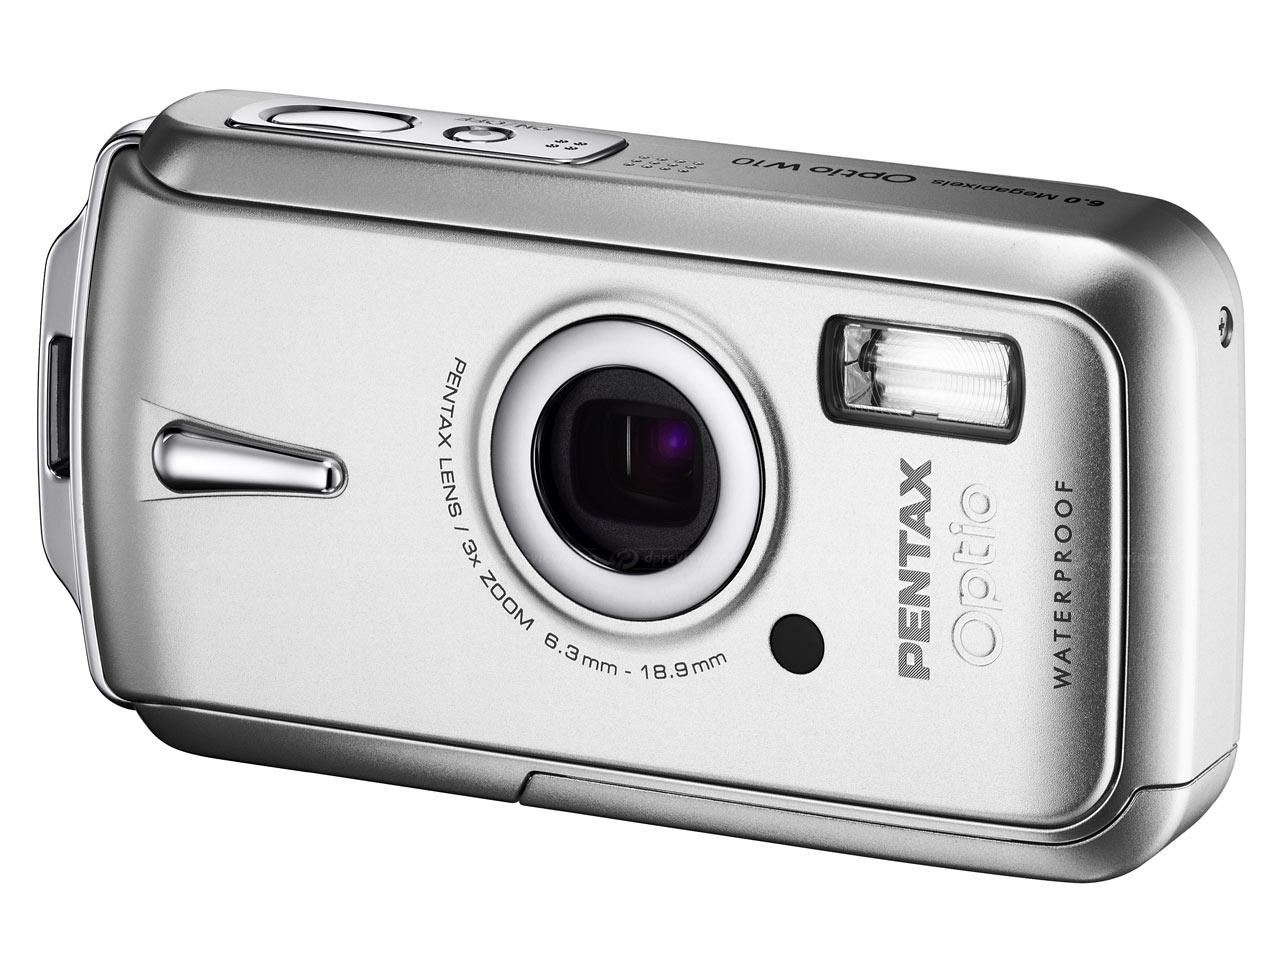 Pentax Optio W10 Digital Photography Review